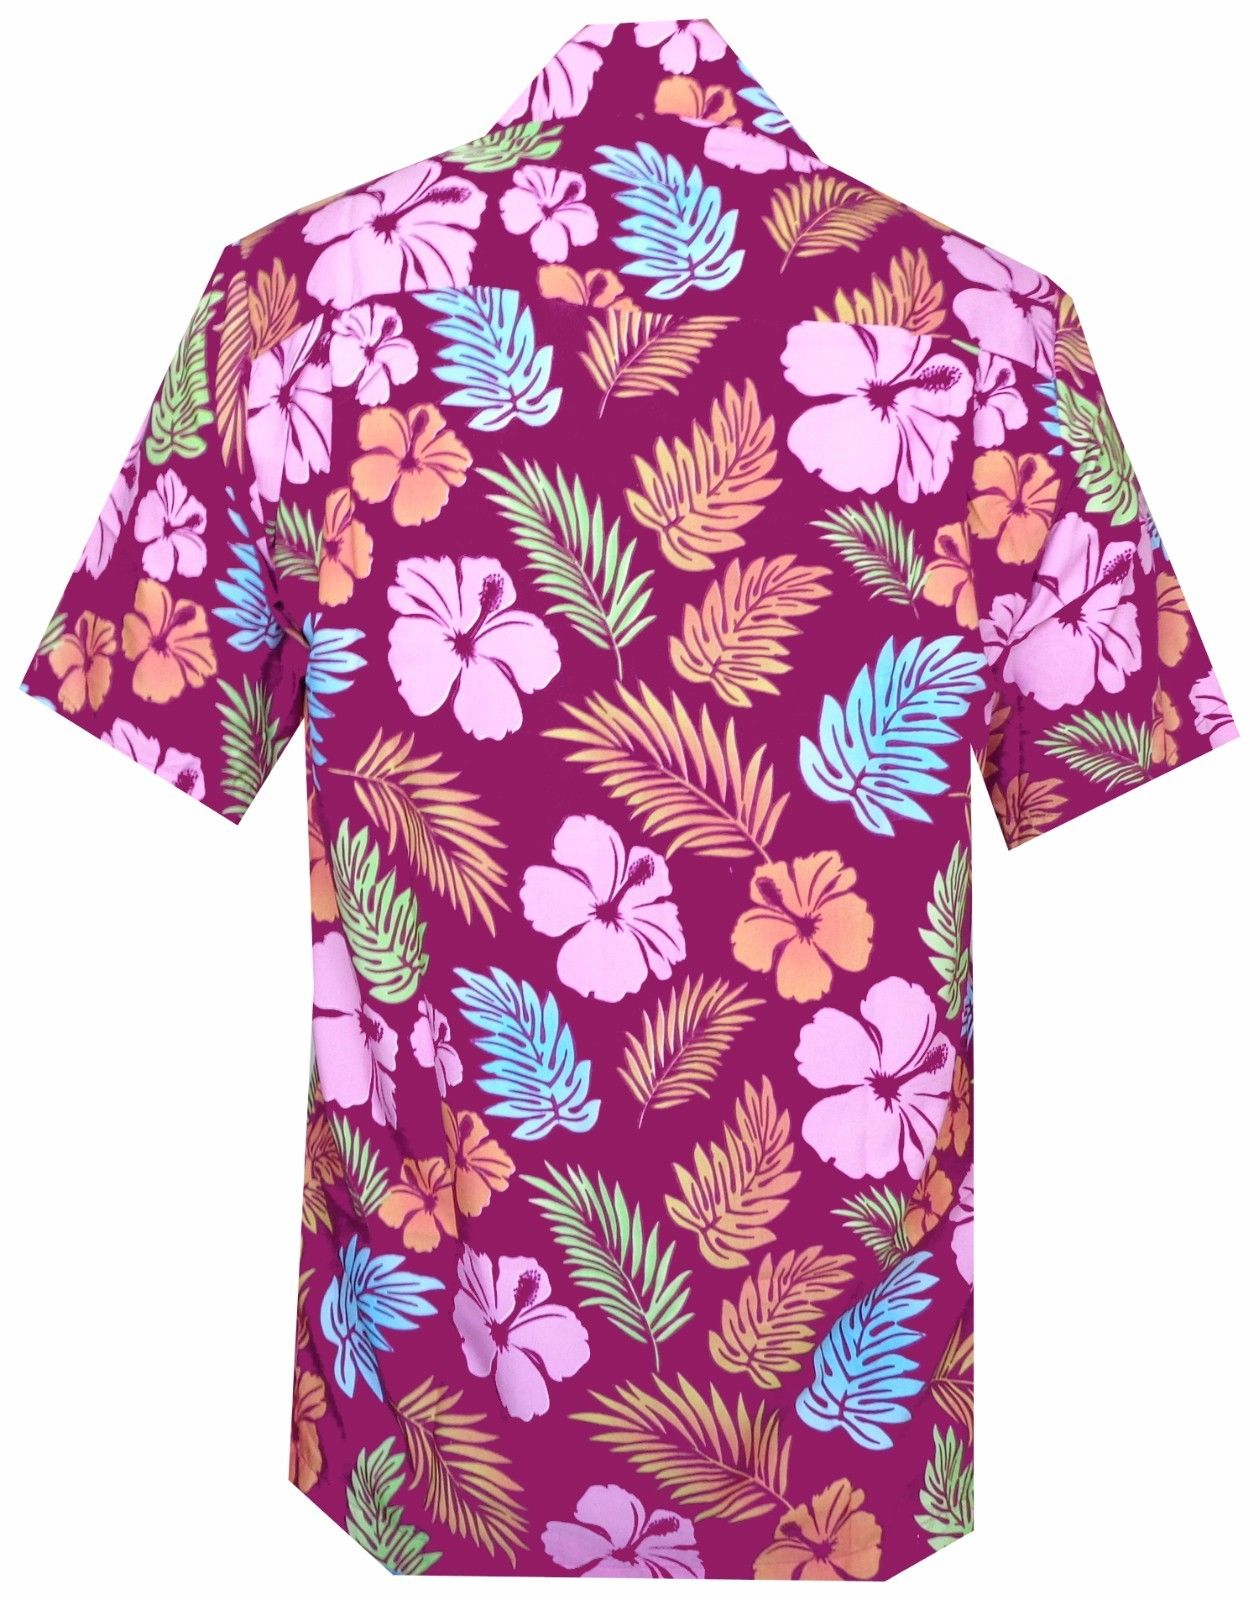 Hawaiian Shirt Mens Hibiscus Floral Leaf Print Beach Aloha